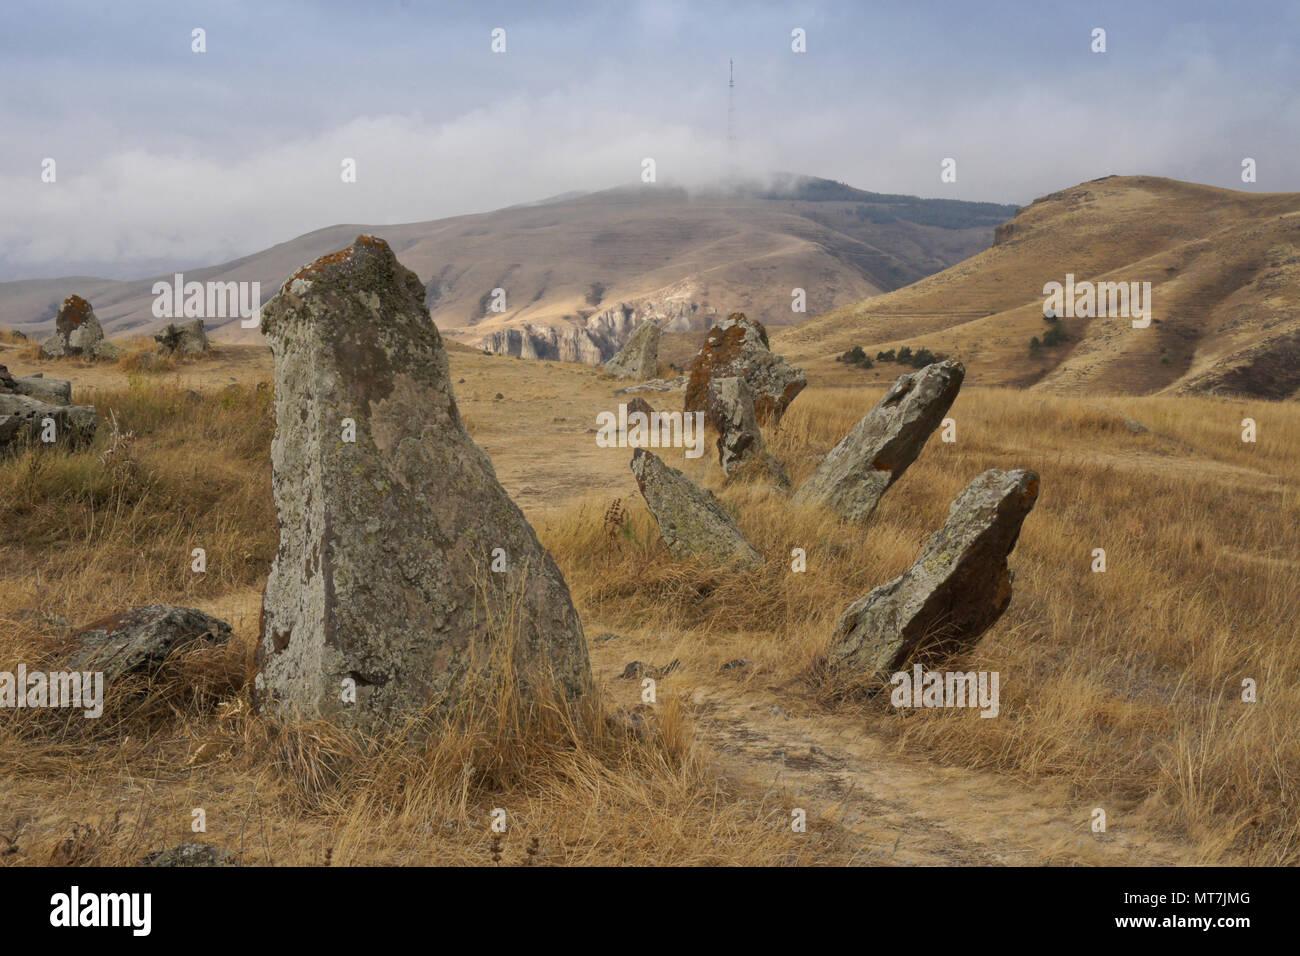 Karahunj (Carahunge) Observatory near the town of Sisian, Armenia - Stock Image